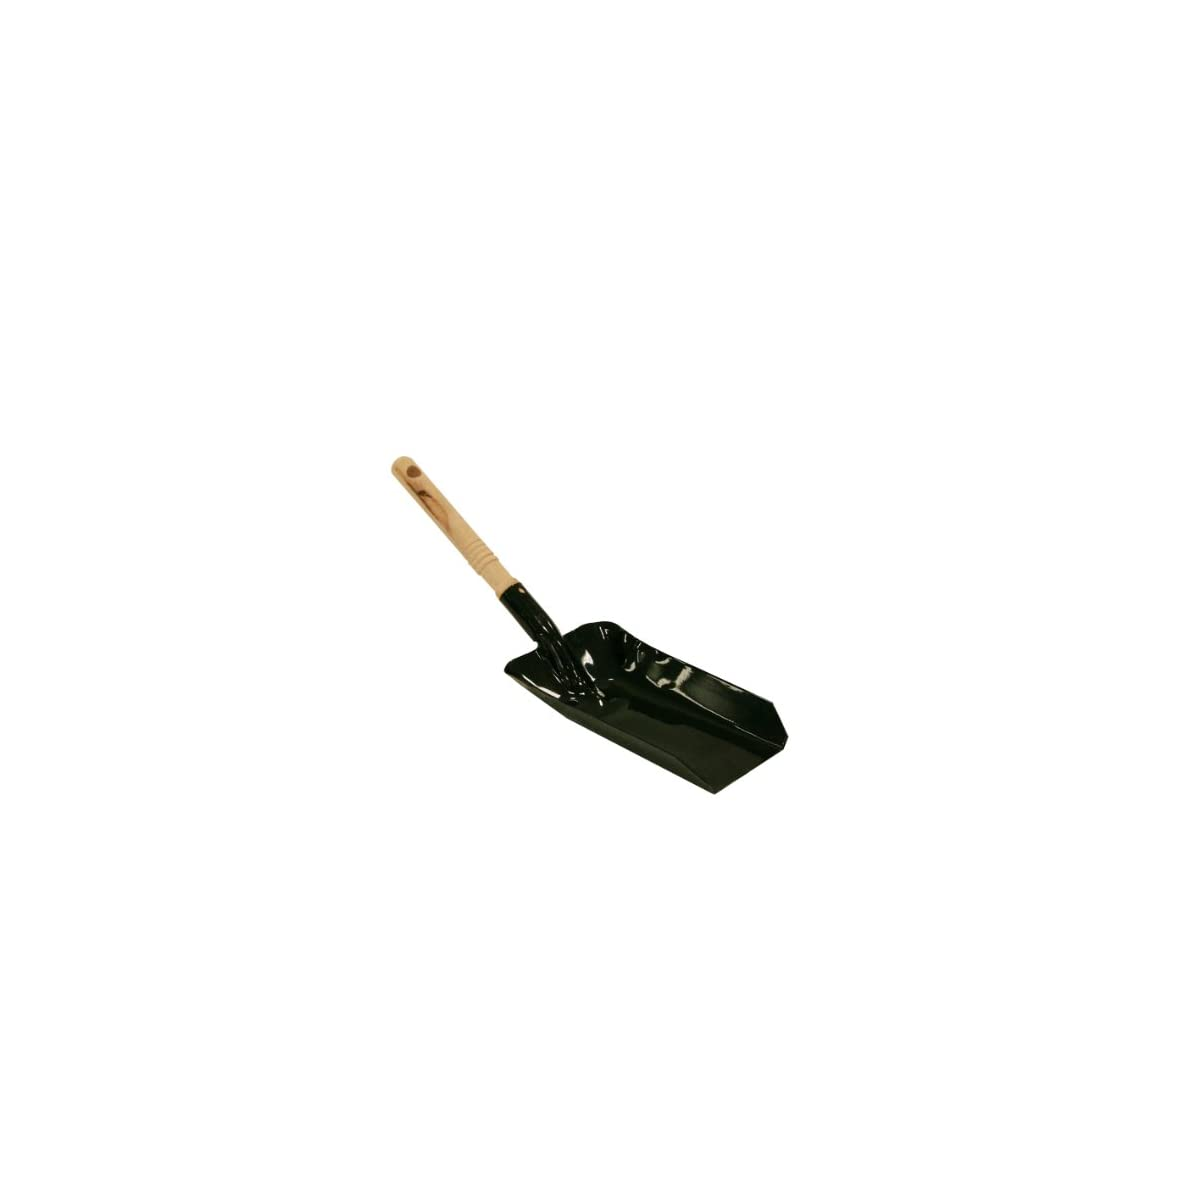 31IQYxmkoyL. SS1200  - Kamino-Flam - Pala con mango para chimenea, Pala de carbón, Recogedor para estufas, barbacoas, chimeneas - metal barnizado/madera natural de alta calidad, 23,5 x 12,5 cm